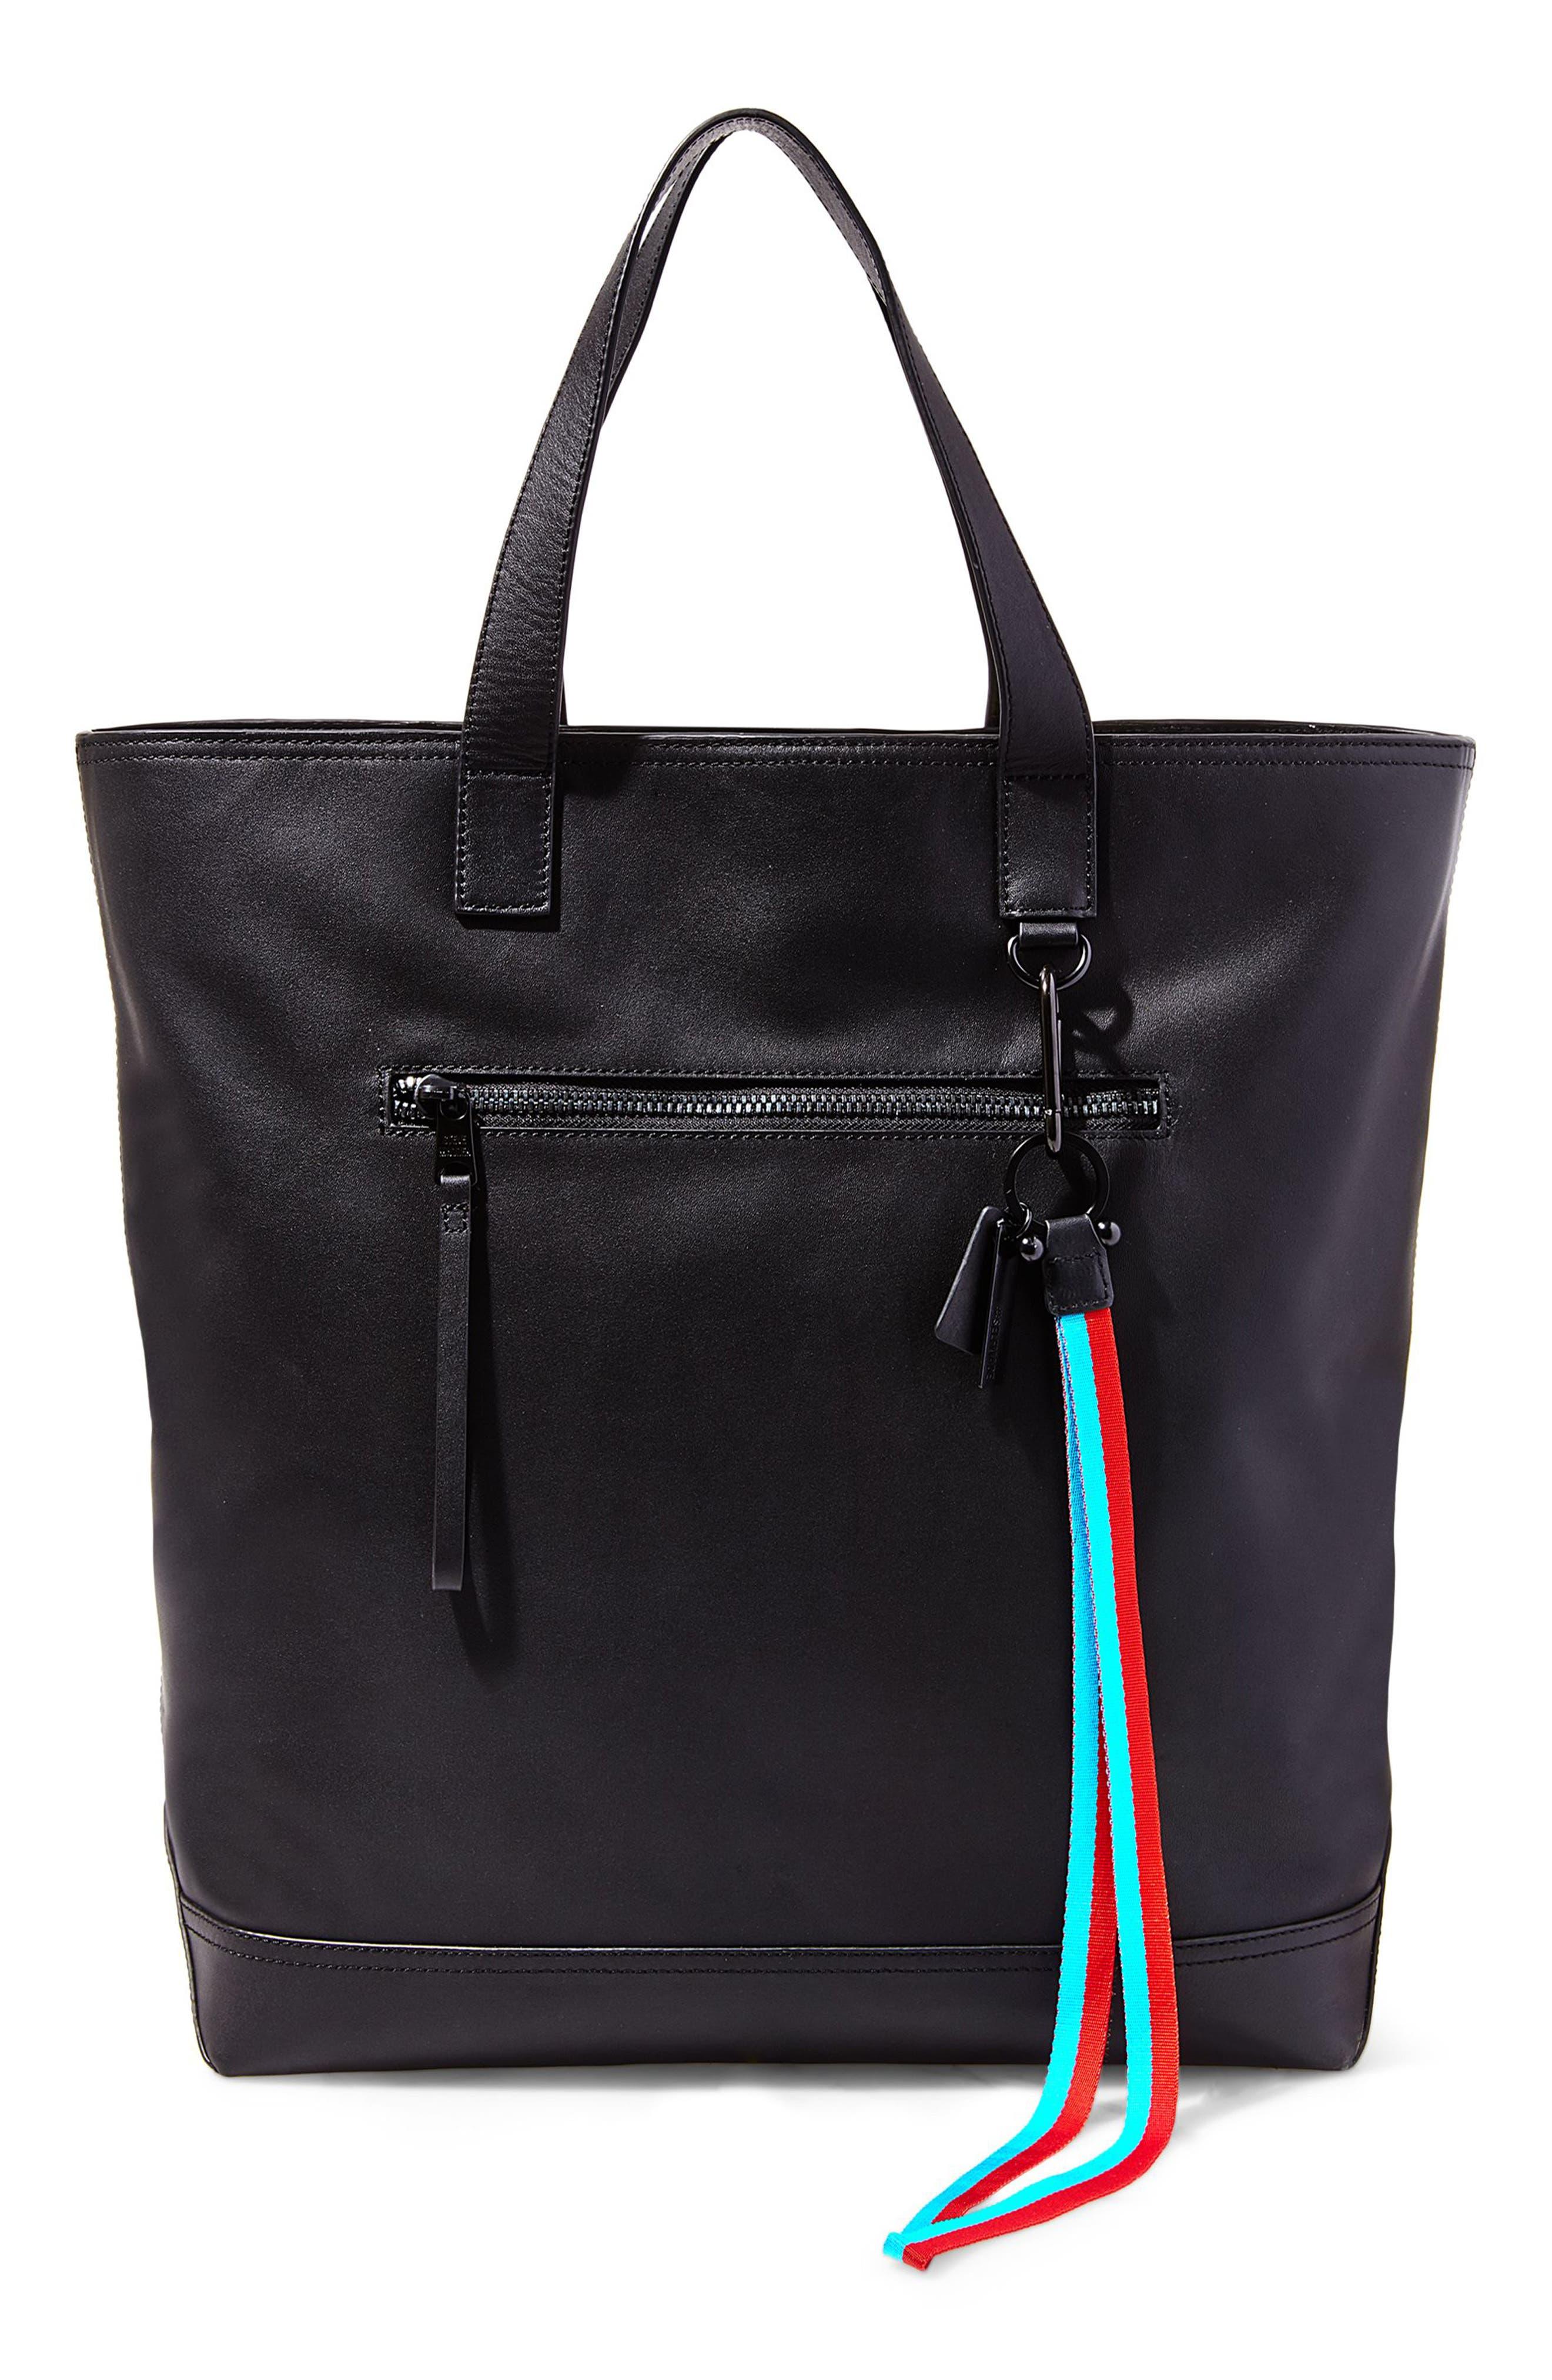 GQ x Steve Madden Leather Tote Bag